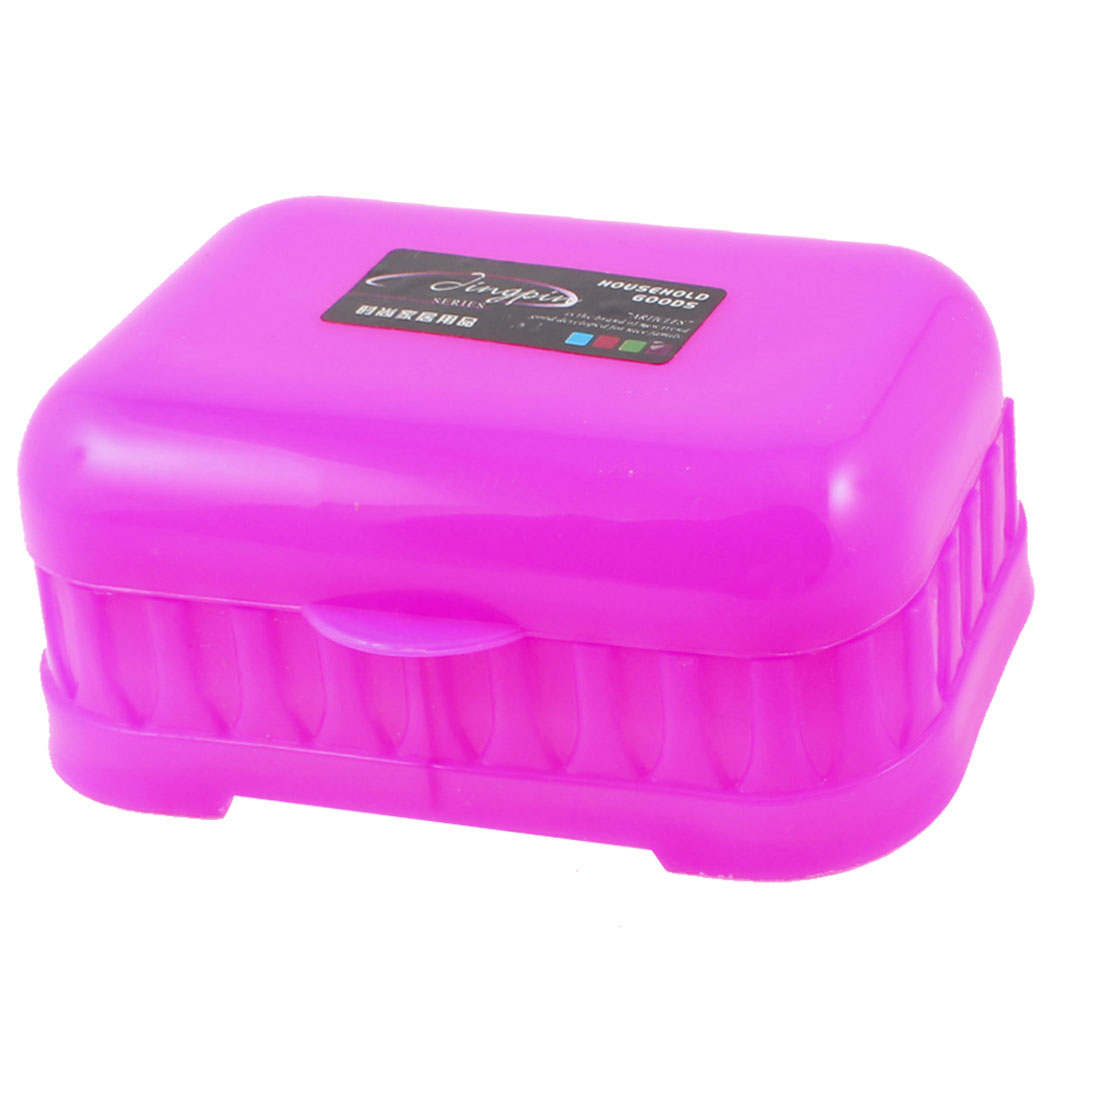 Household Rectangle Shape Plastic Plastic Soap Dish Holder Box Fuchsia